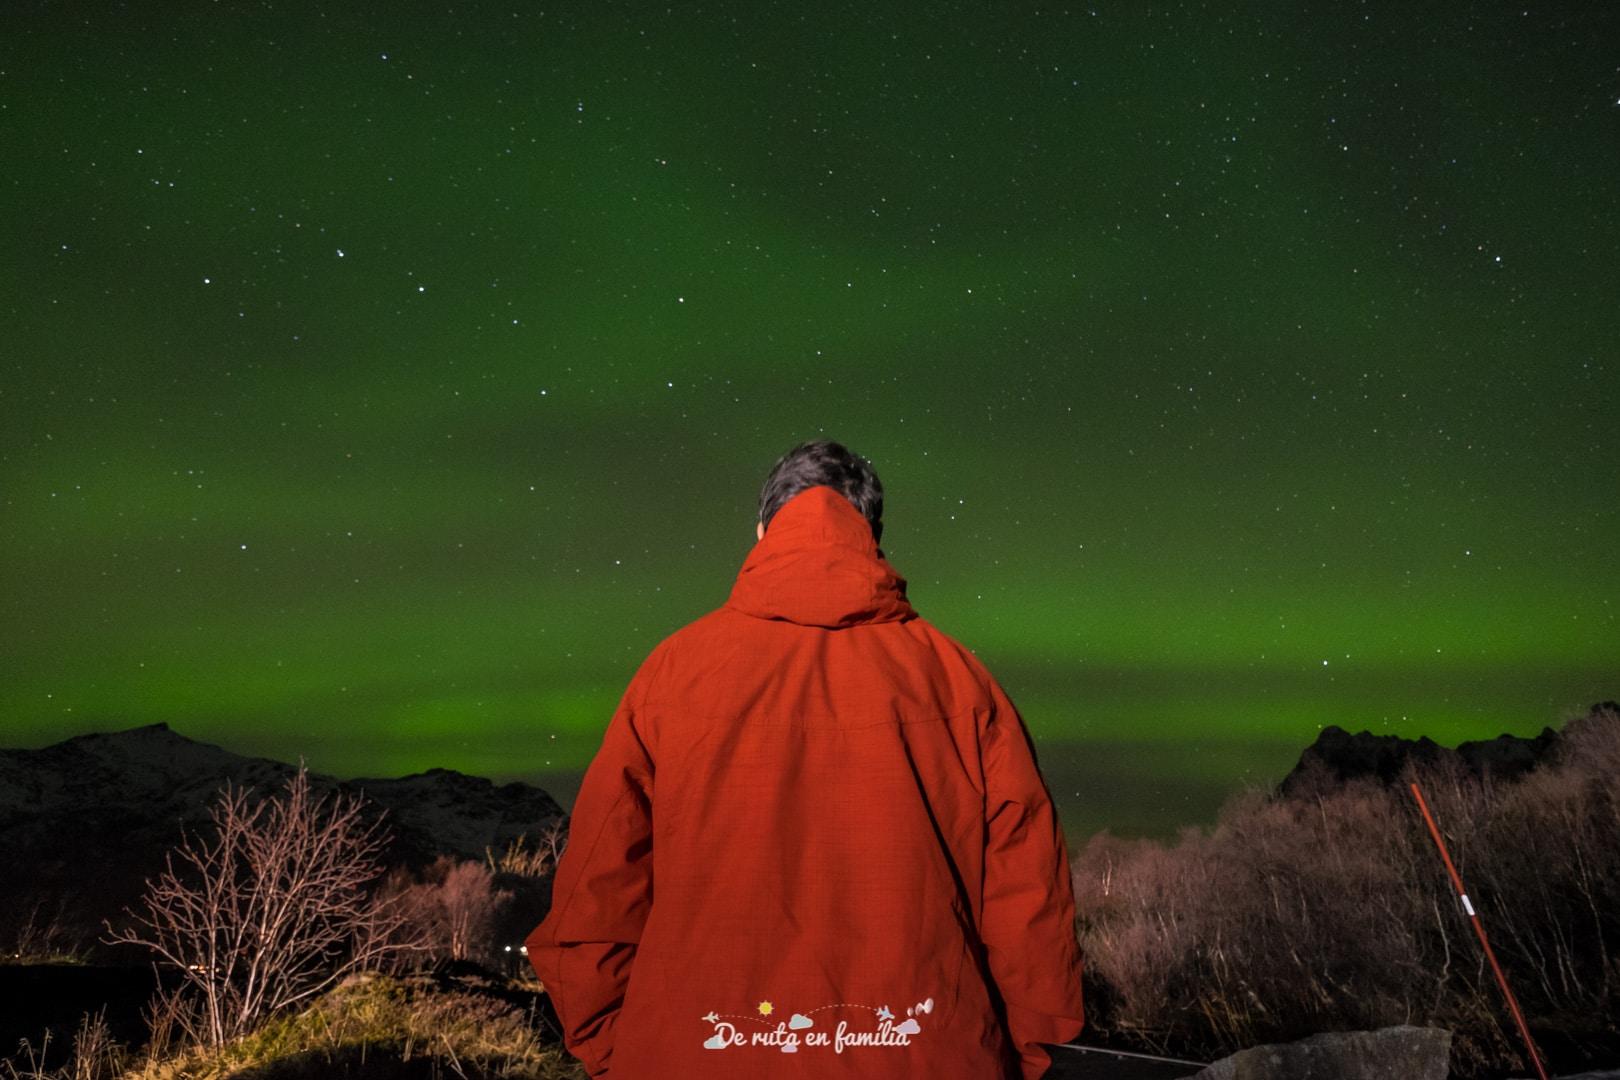 fotografiar aurores boreals